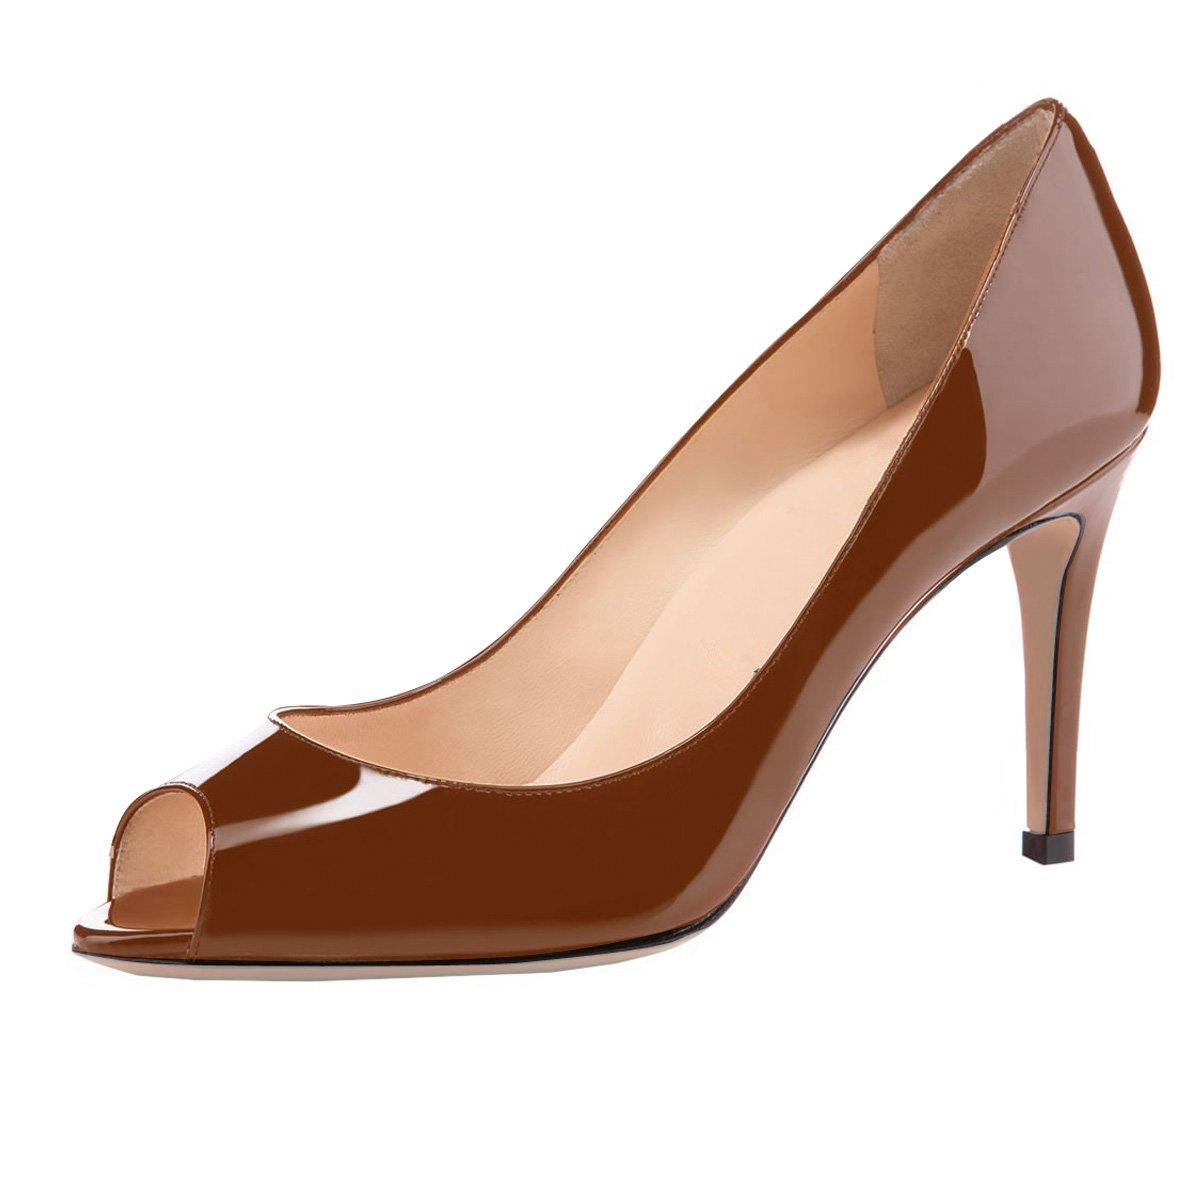 Eldof Women Peep Toe Pumps Mid-Heel Pumps Formal Wedding Bridal Classic Heel Open Toe Stiletto B07F1LTKLK 5.5 B(M) US|Brown